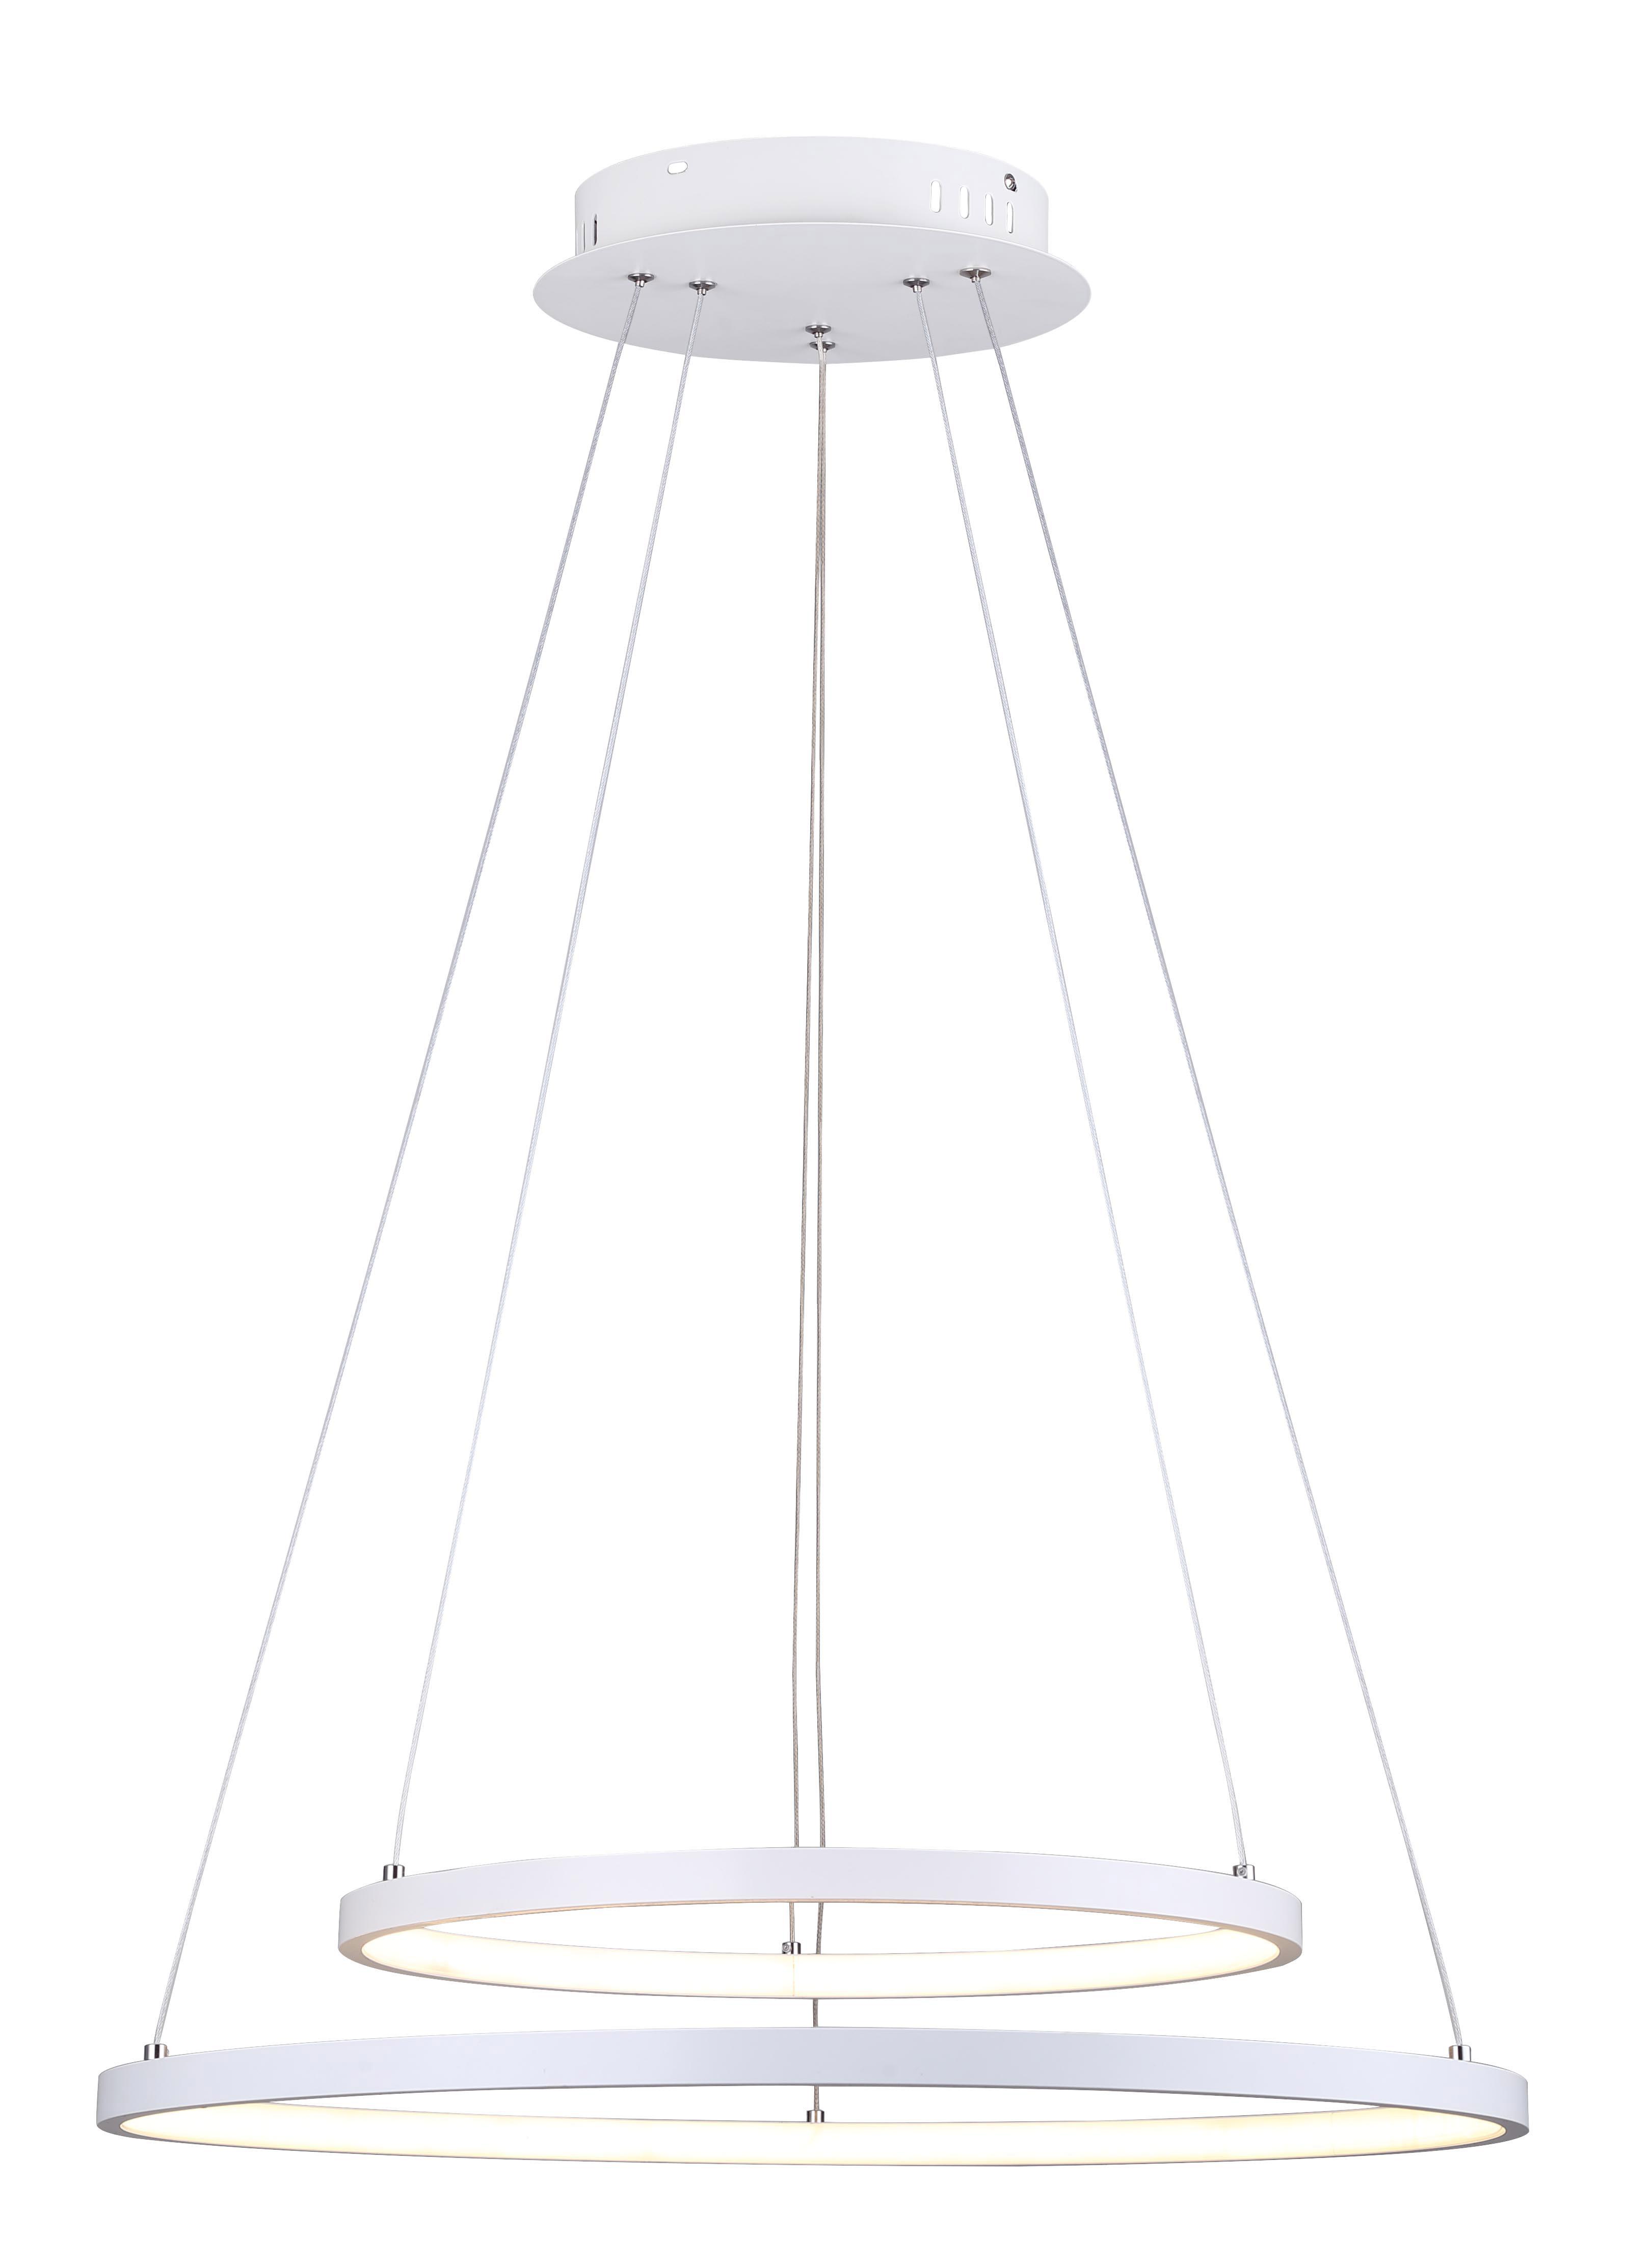 Pendant Lighting Modern LEXIE Canarm LCH128A24WH